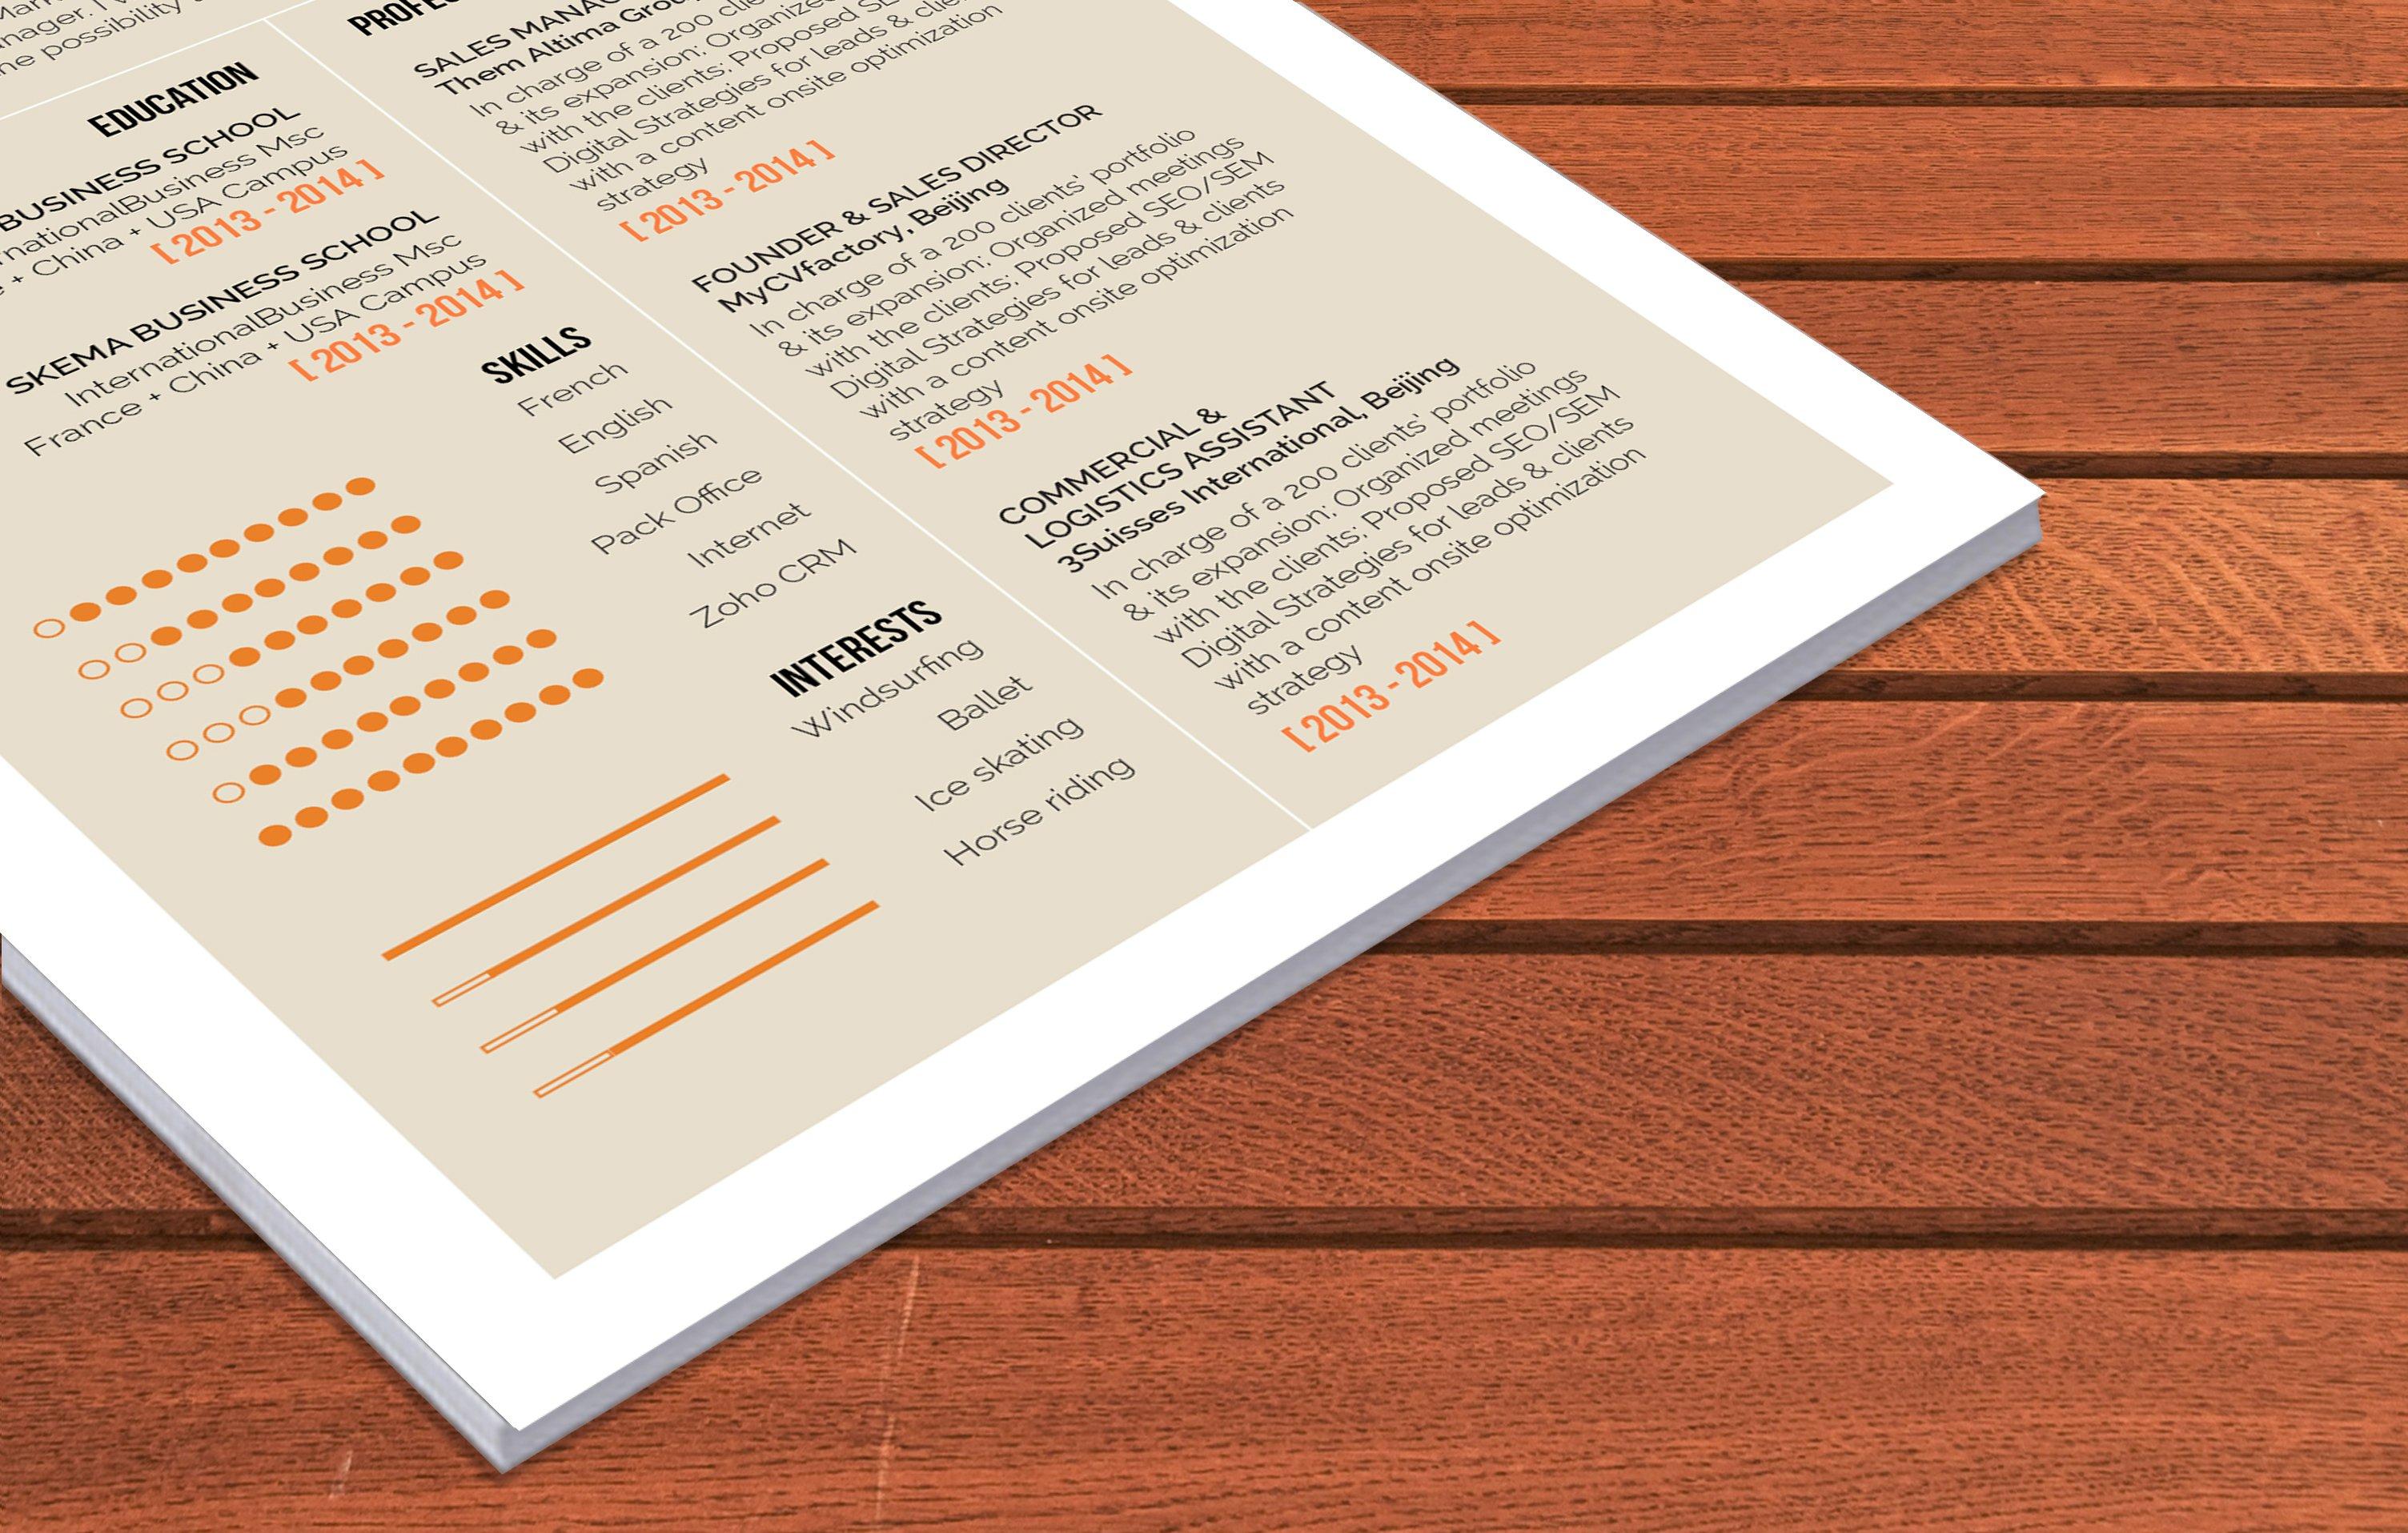 free-resume-mycvfactory-inspiration-1_isuoJCg.jpg